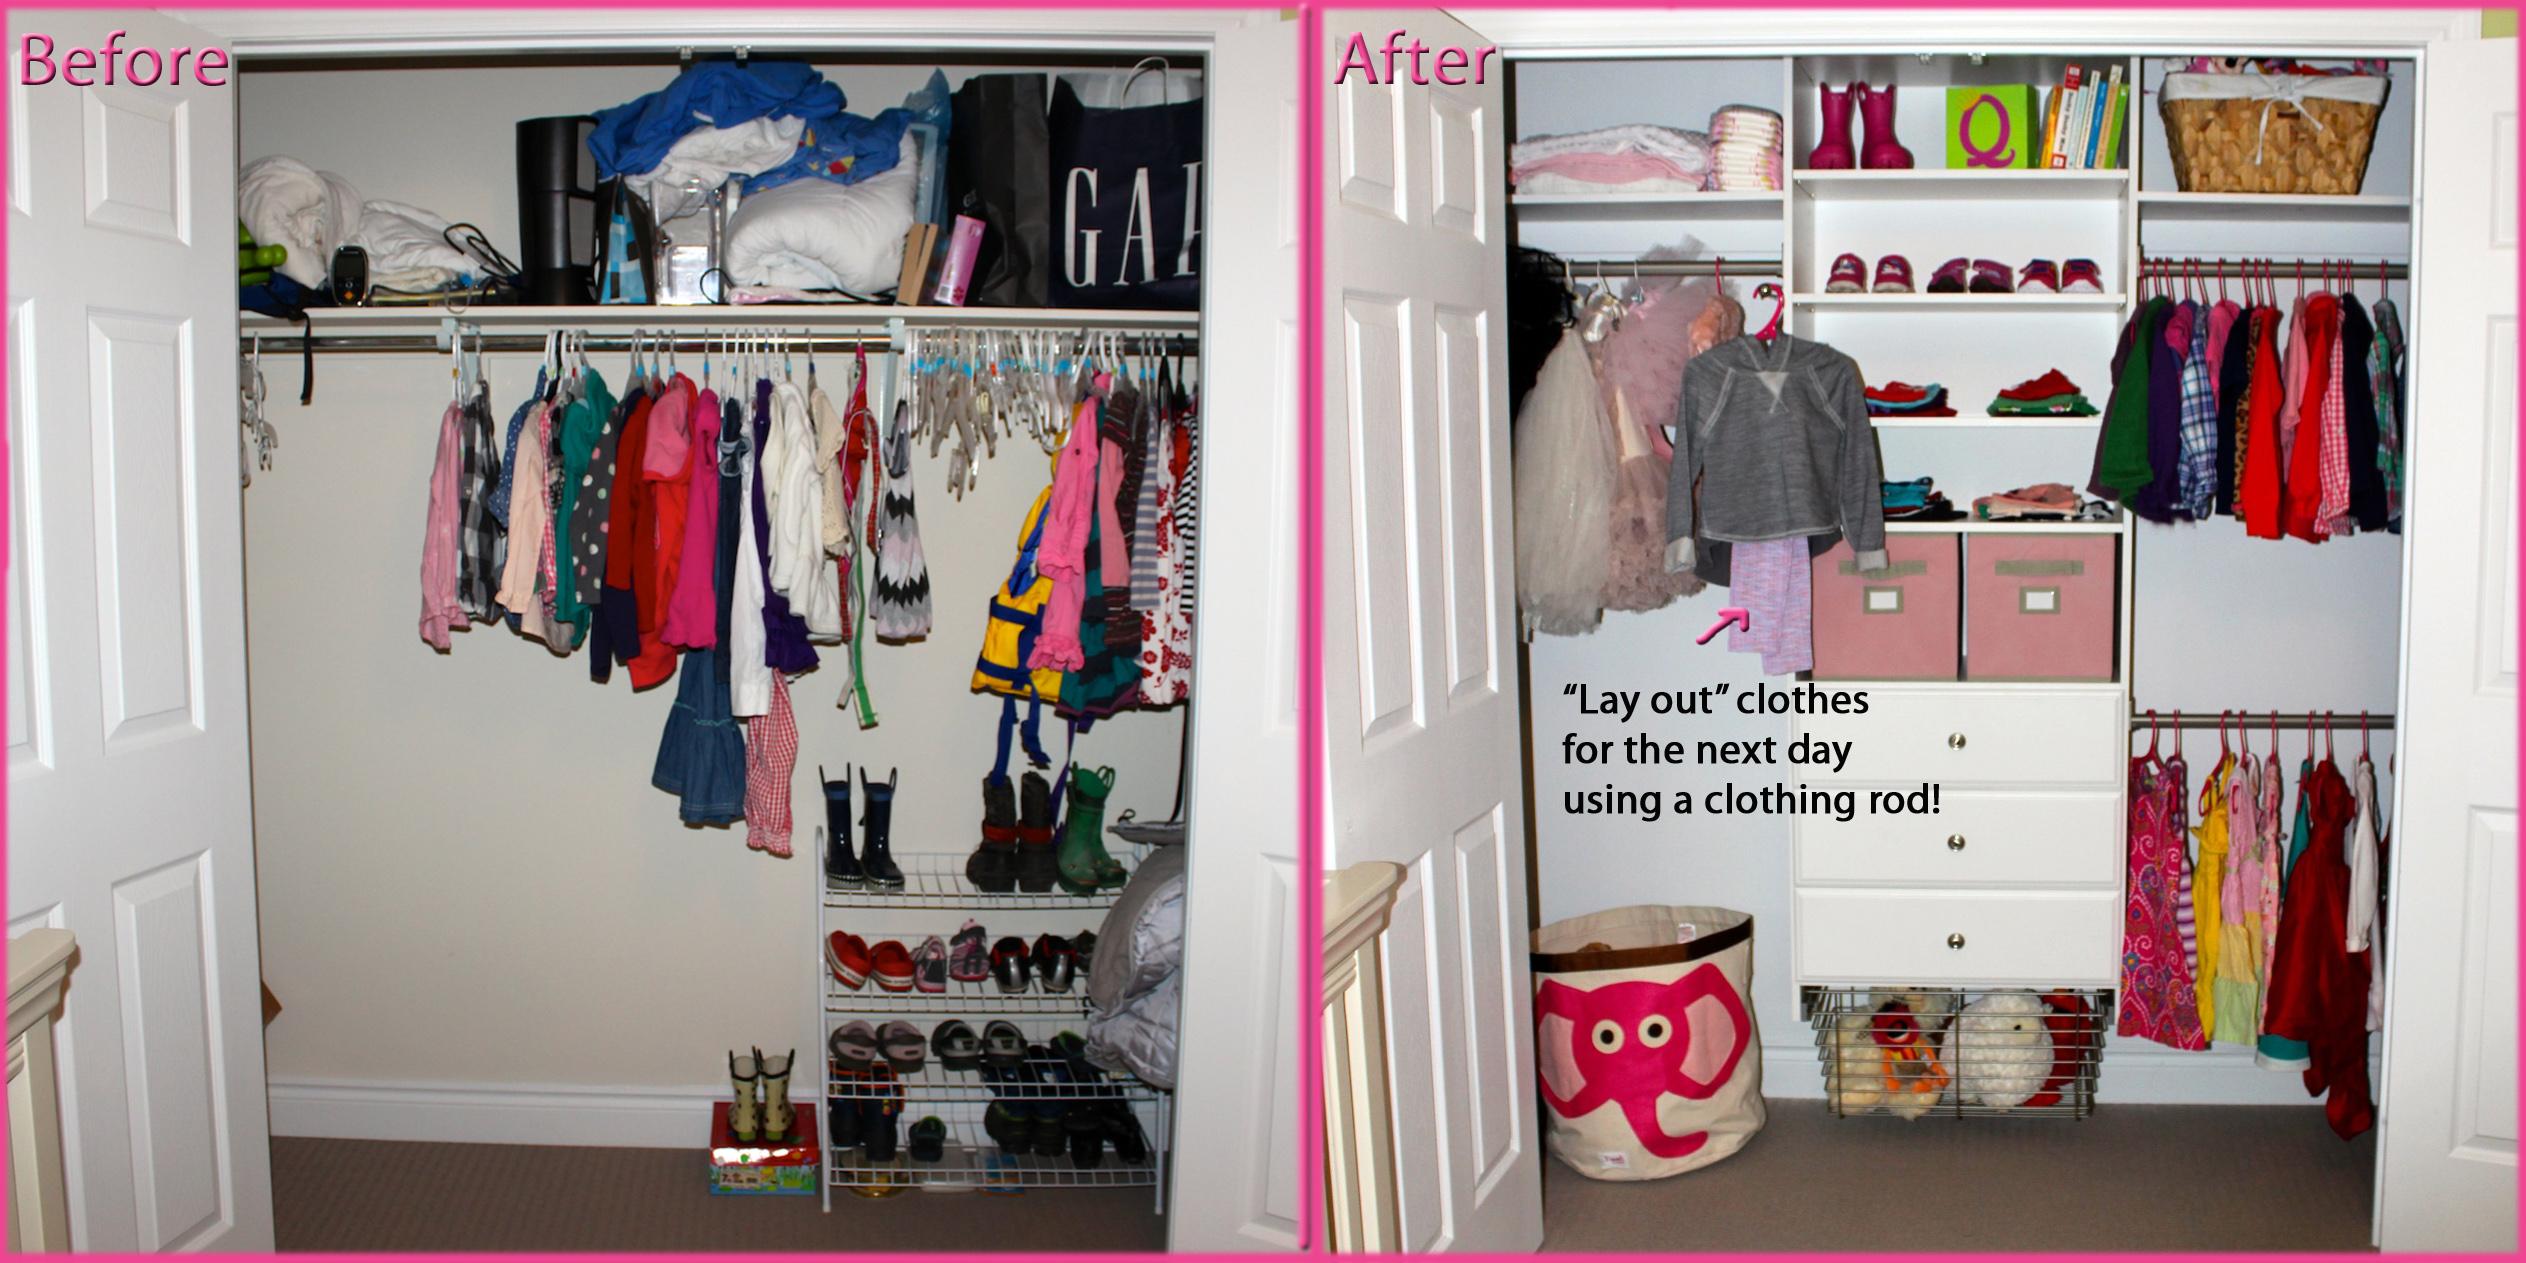 Shapely Martha Stewart Living Closet Closet Organization On Any Budget Rubbermaid Closet Designer Lowes Rubbermaid Custom Closet houzz 01 Rubbermaid Closet Designer